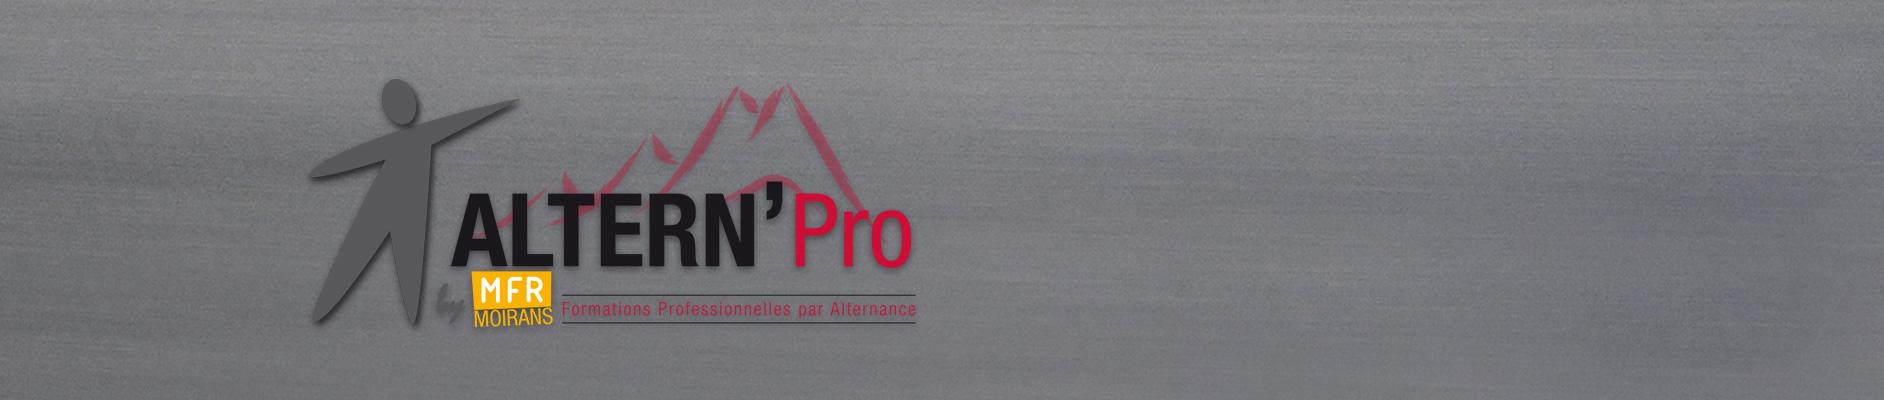 homeslider-Altern-Pro-fond